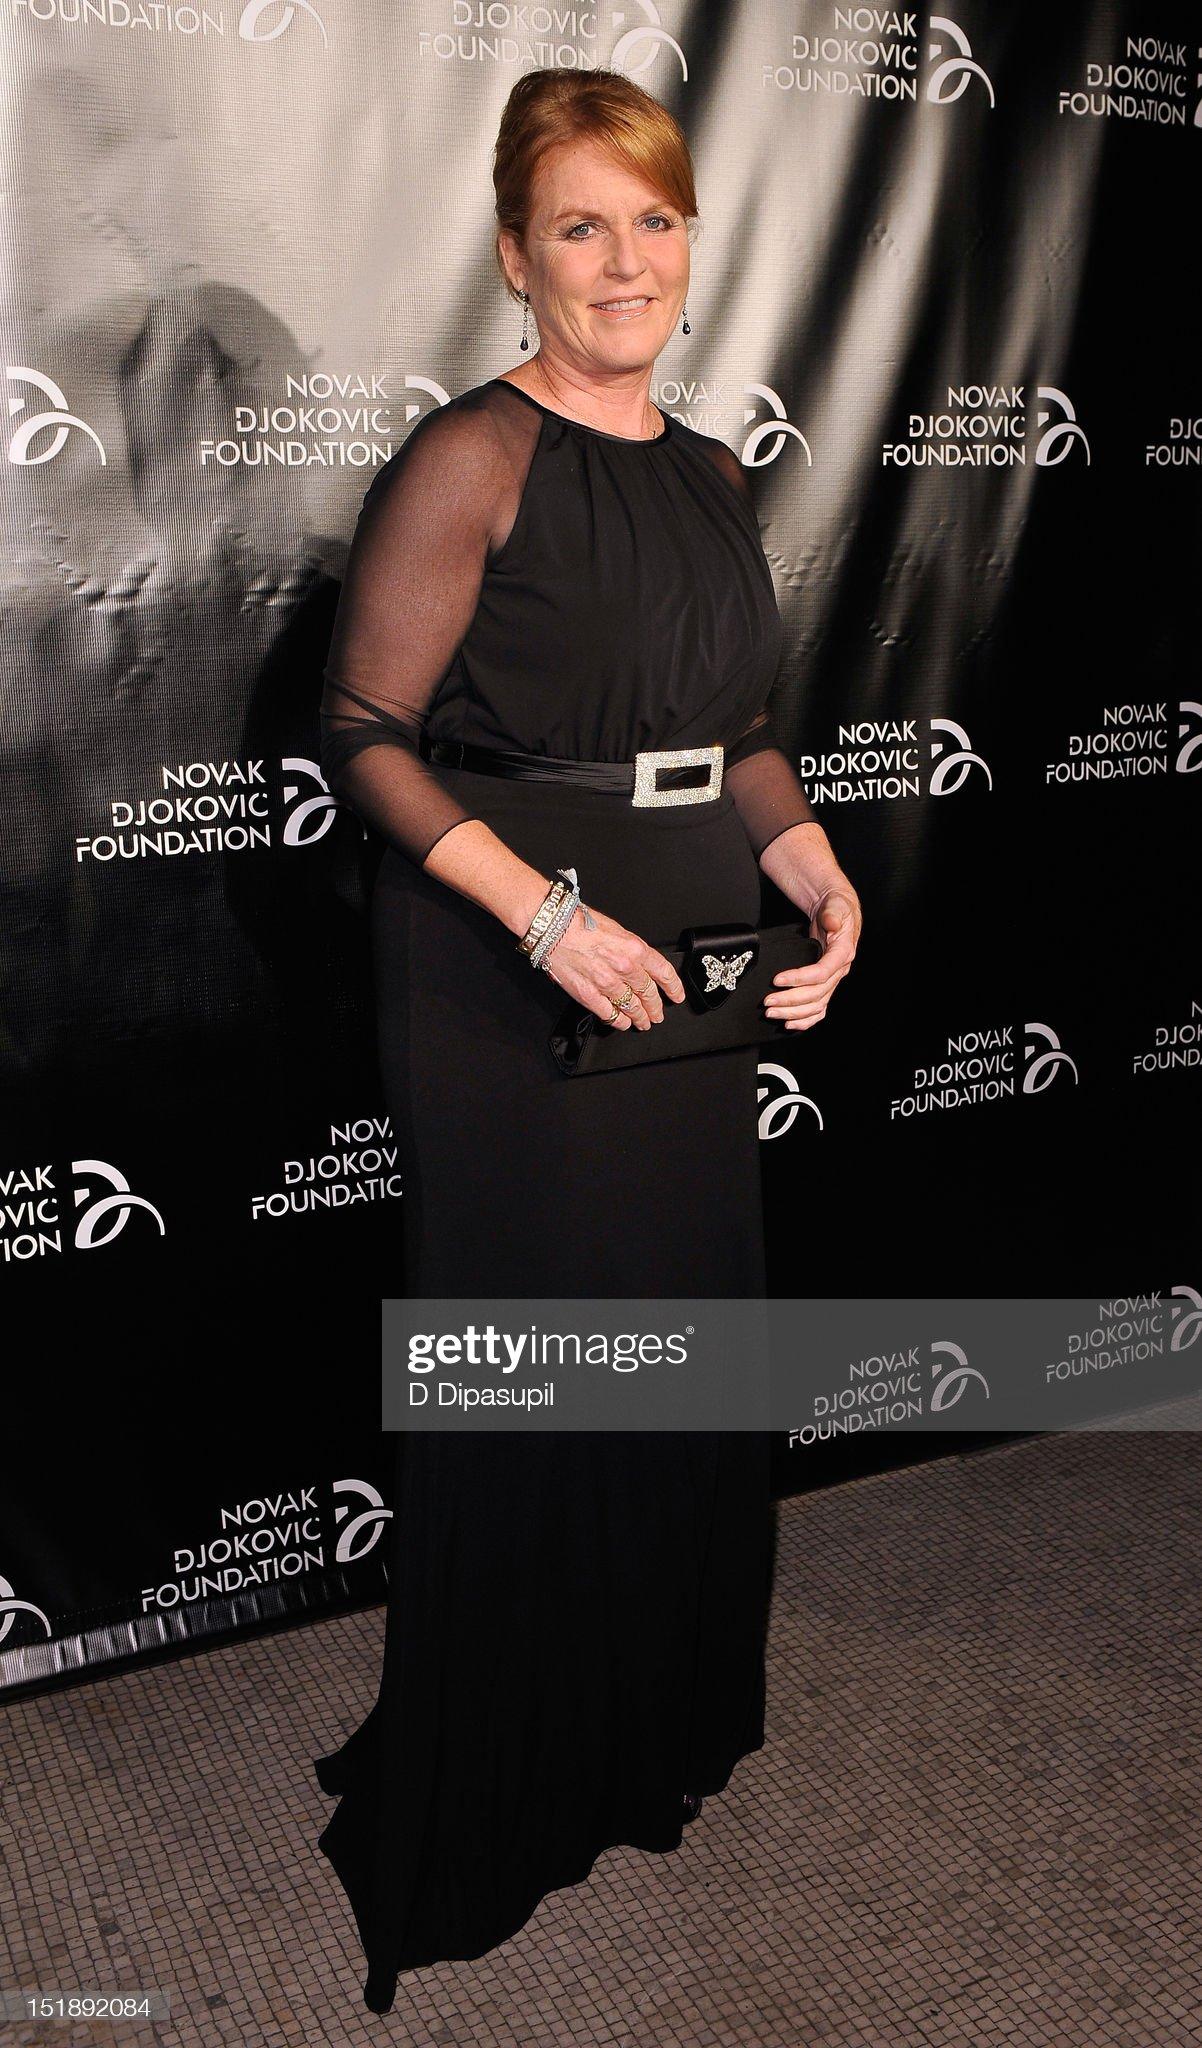 The Novak Djokovic Foundation Inaugural Dinner - Red Carpet : News Photo